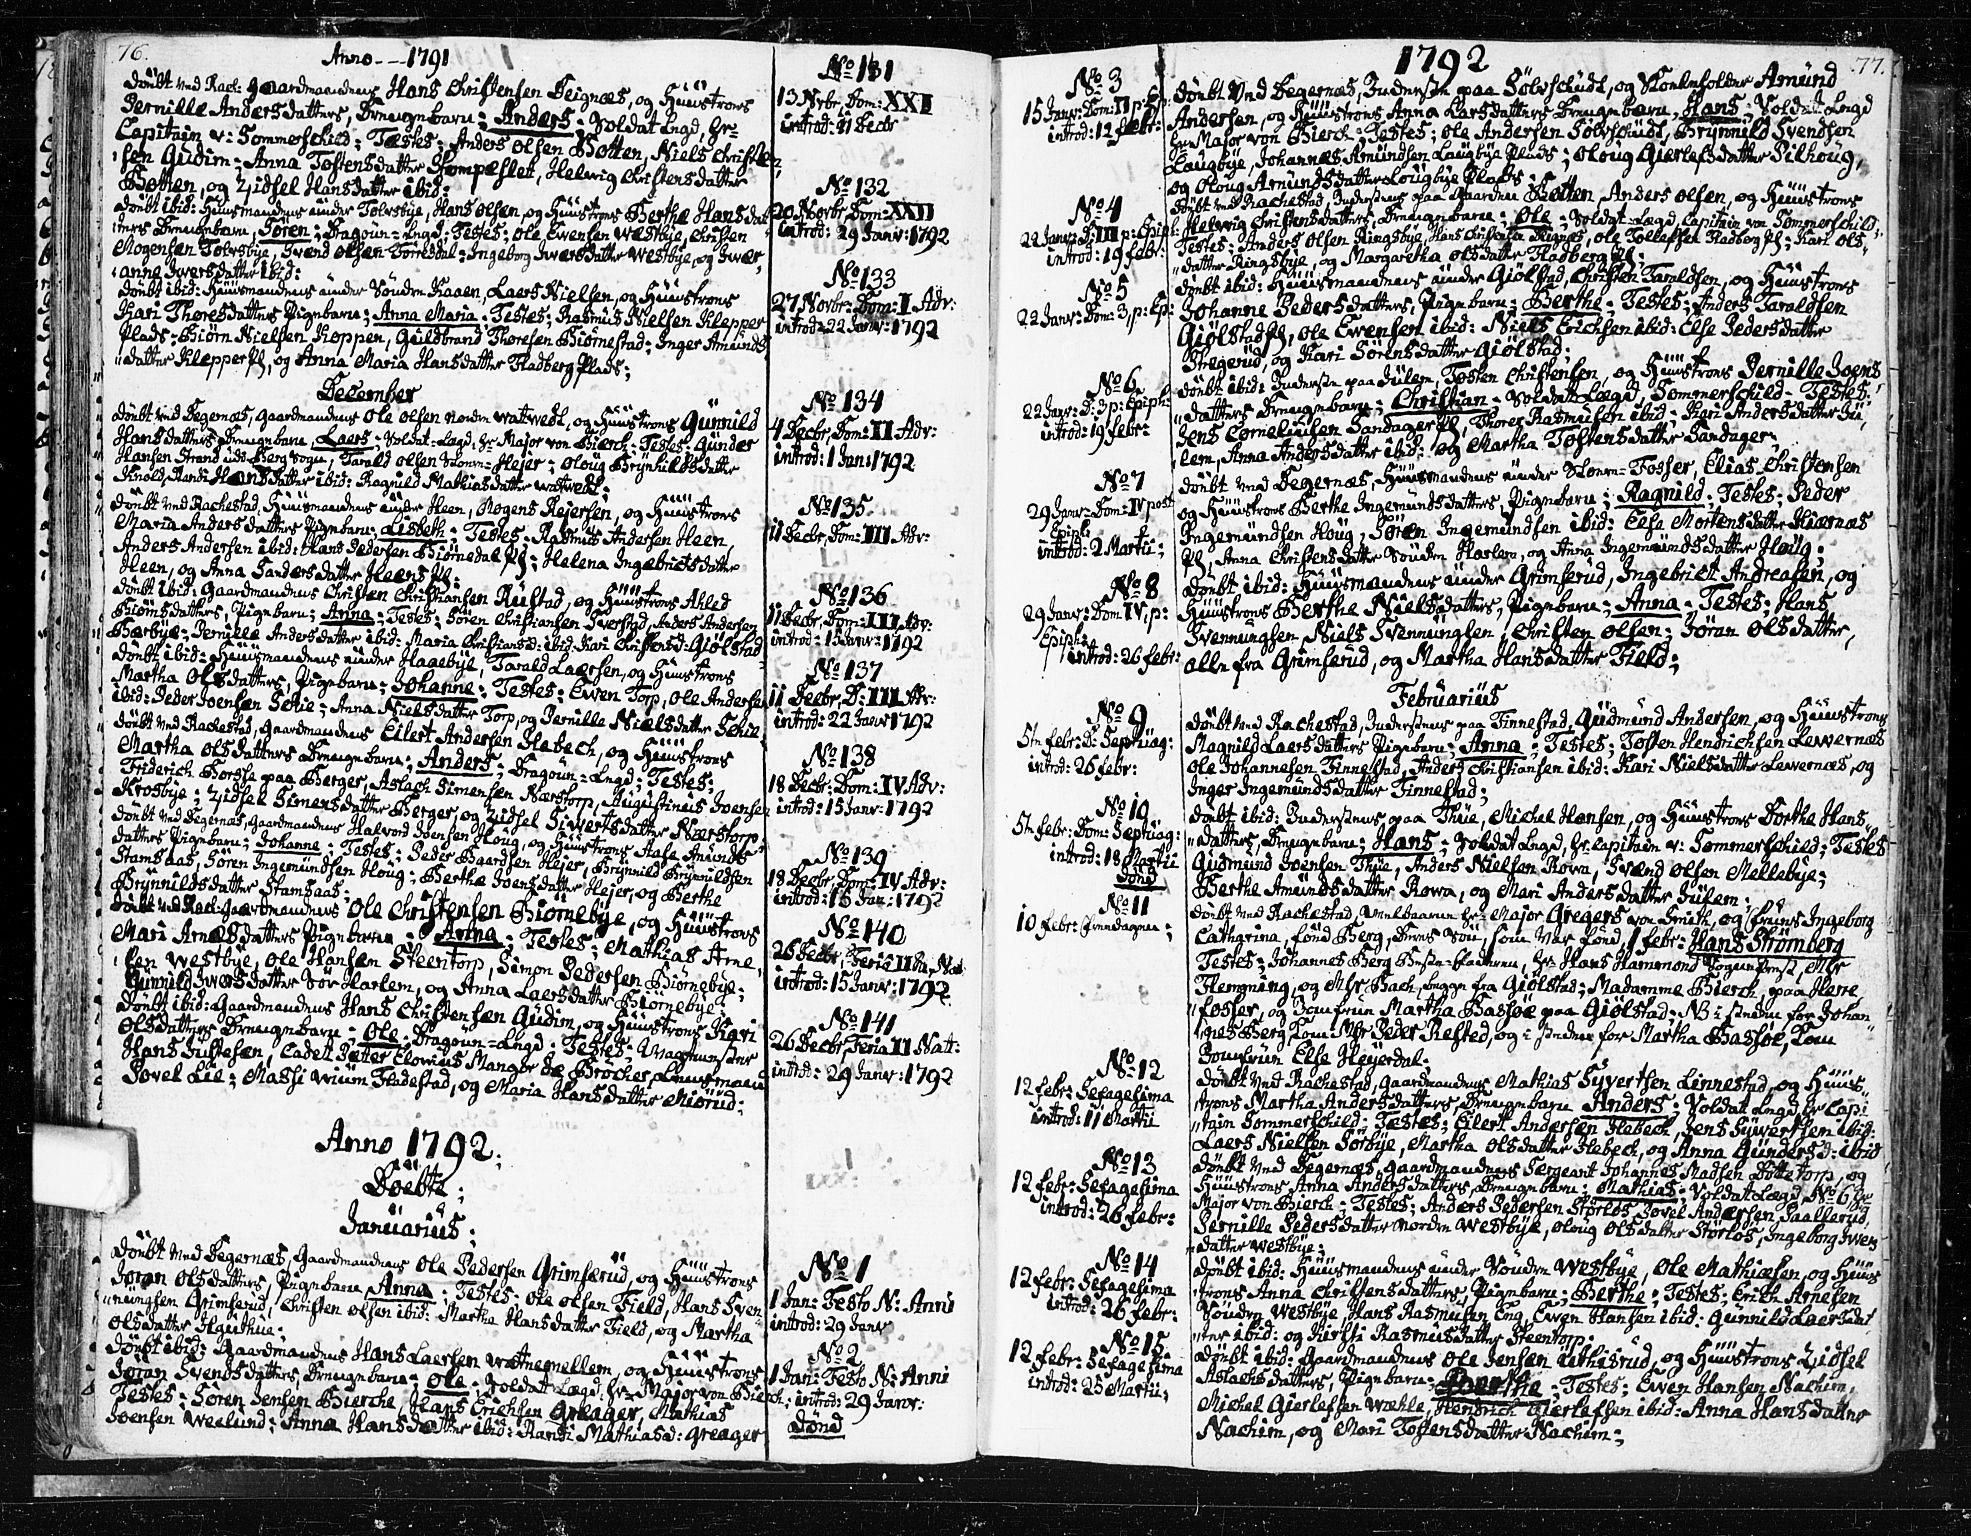 SAO, Rakkestad prestekontor Kirkebøker, F/Fa/L0005: Ministerialbok nr. I 5, 1784-1814, s. 76-77